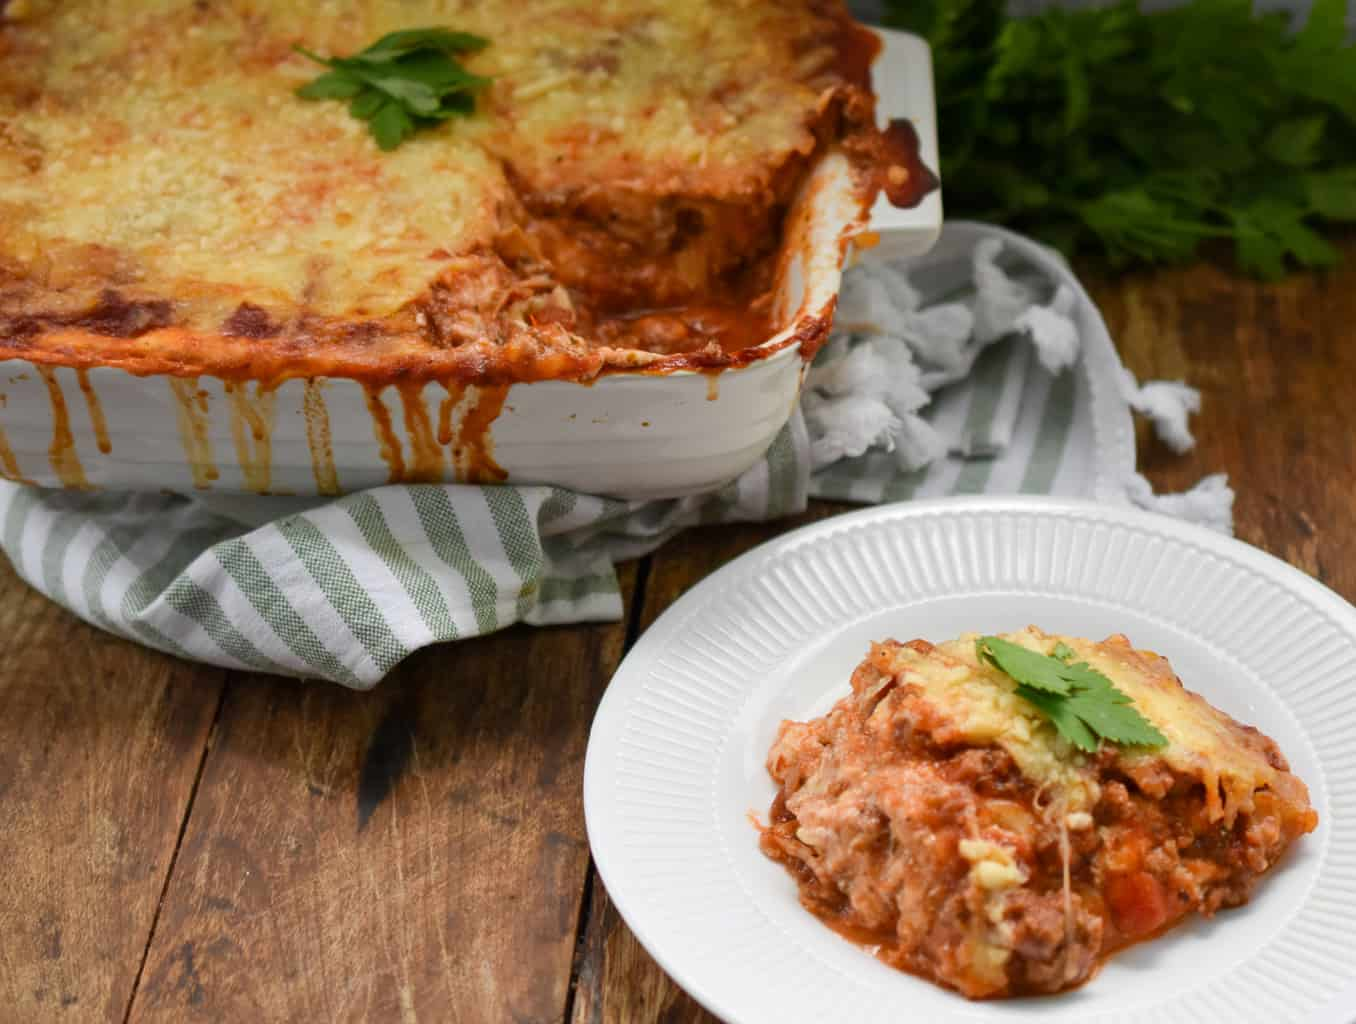 Keto Crepini Lasagna Served